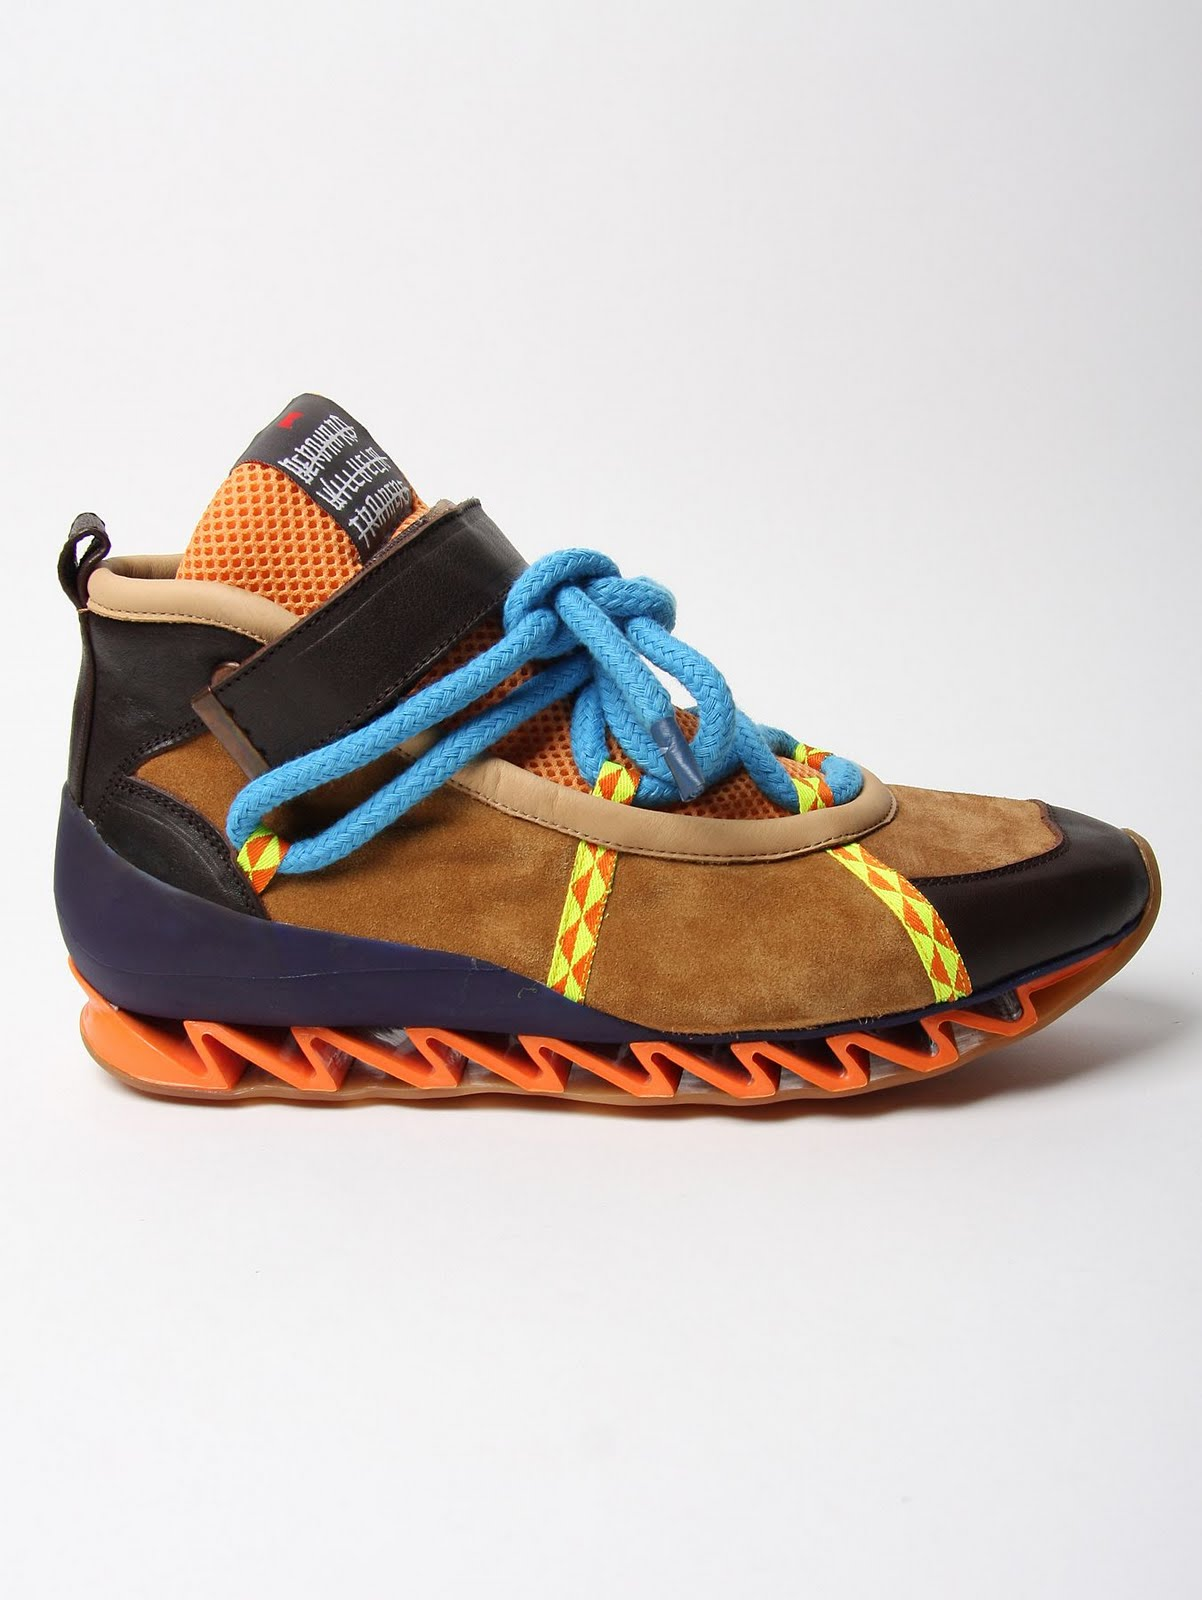 Hiking Shoes Sale Melbourne